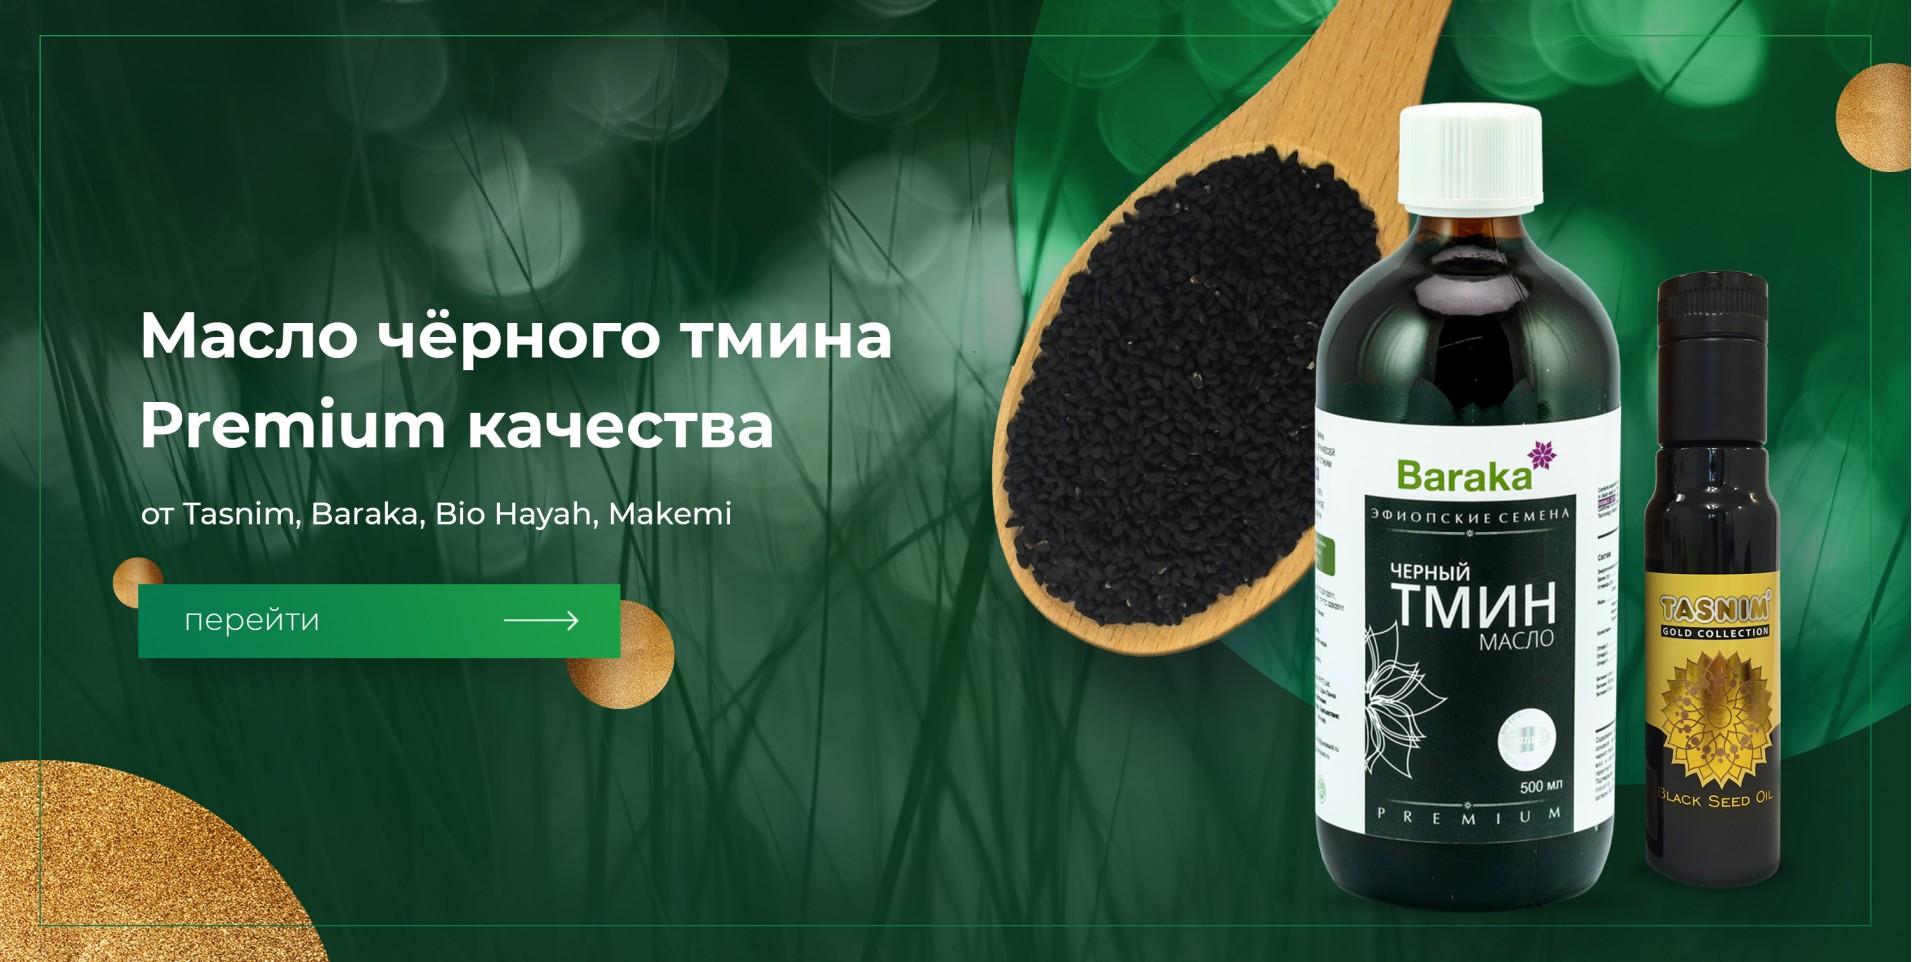 Масло черного тмина Premium